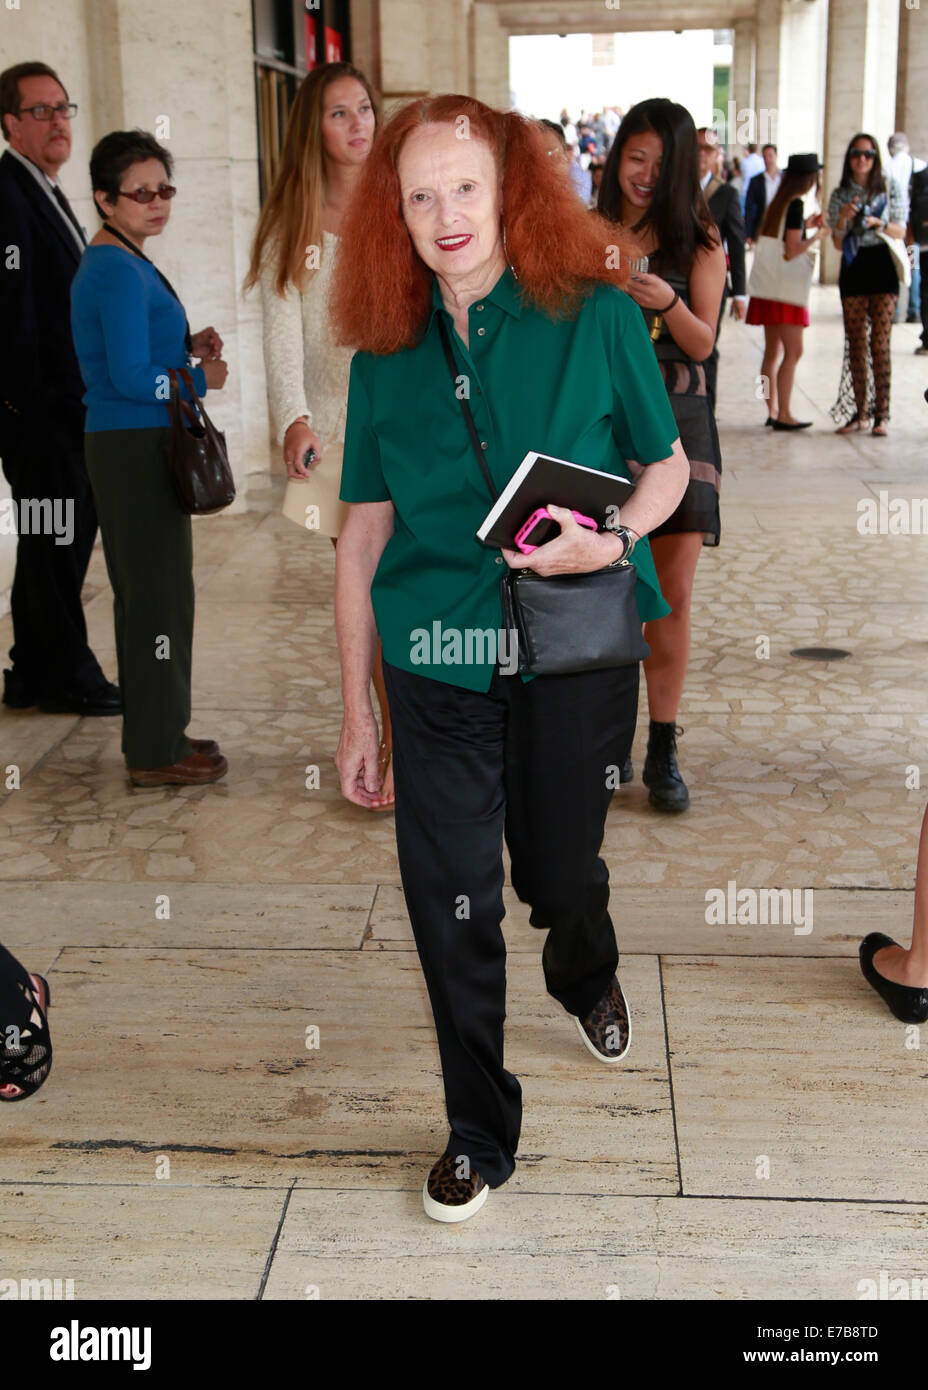 Grace Coddington, Vogue Creative Director leaving the Carolina Herrera runway show in New York City - Sept 8, 2014 - Stock Image